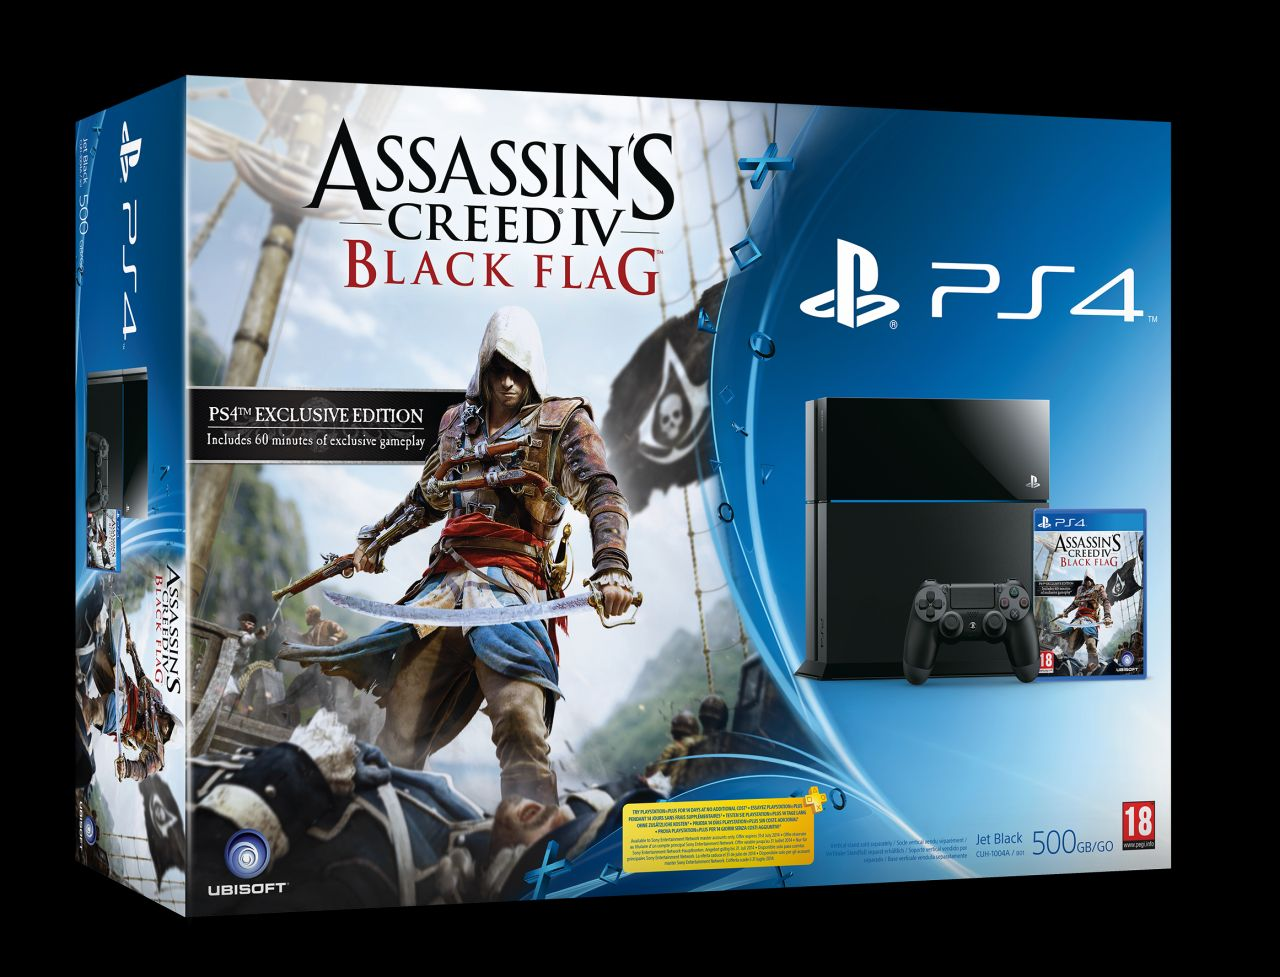 Assassin S Creed 4 Black Flag Ps4 Bundle Confirmed For The Uk Vg247